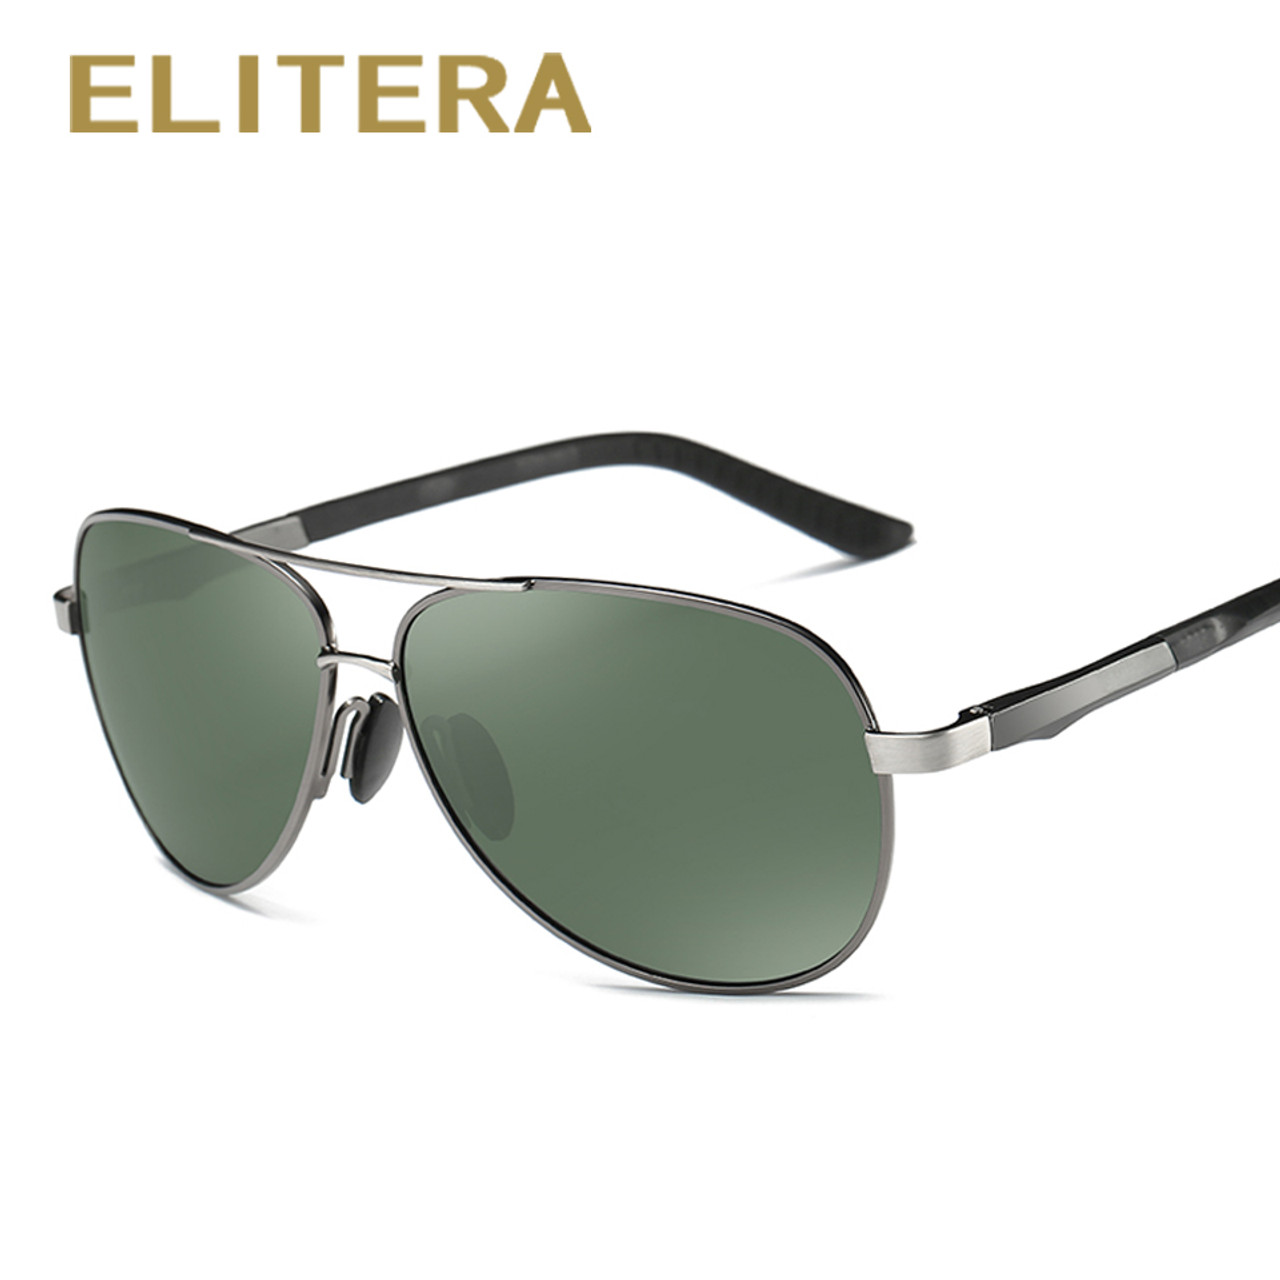 cad2b3ab6a ... ELITERA Aluminum Magnesium Brand Polarized Sunglasses Men New Design  Fishing Driving Sun Glasses Eyewear Oculos Gafas ...